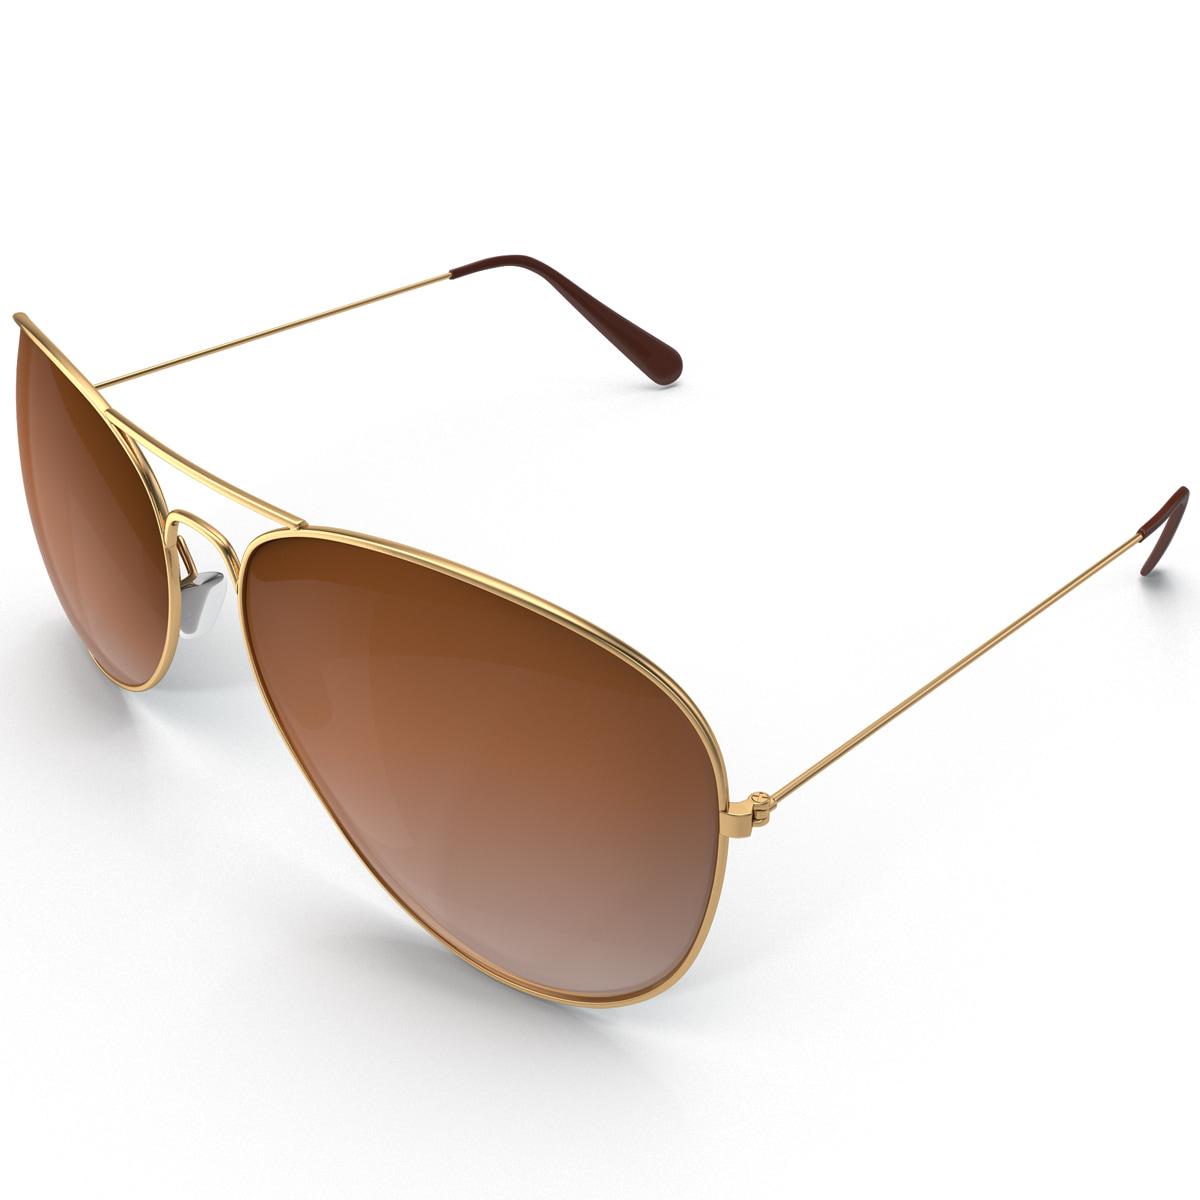 Sunglasses_6_005.jpg